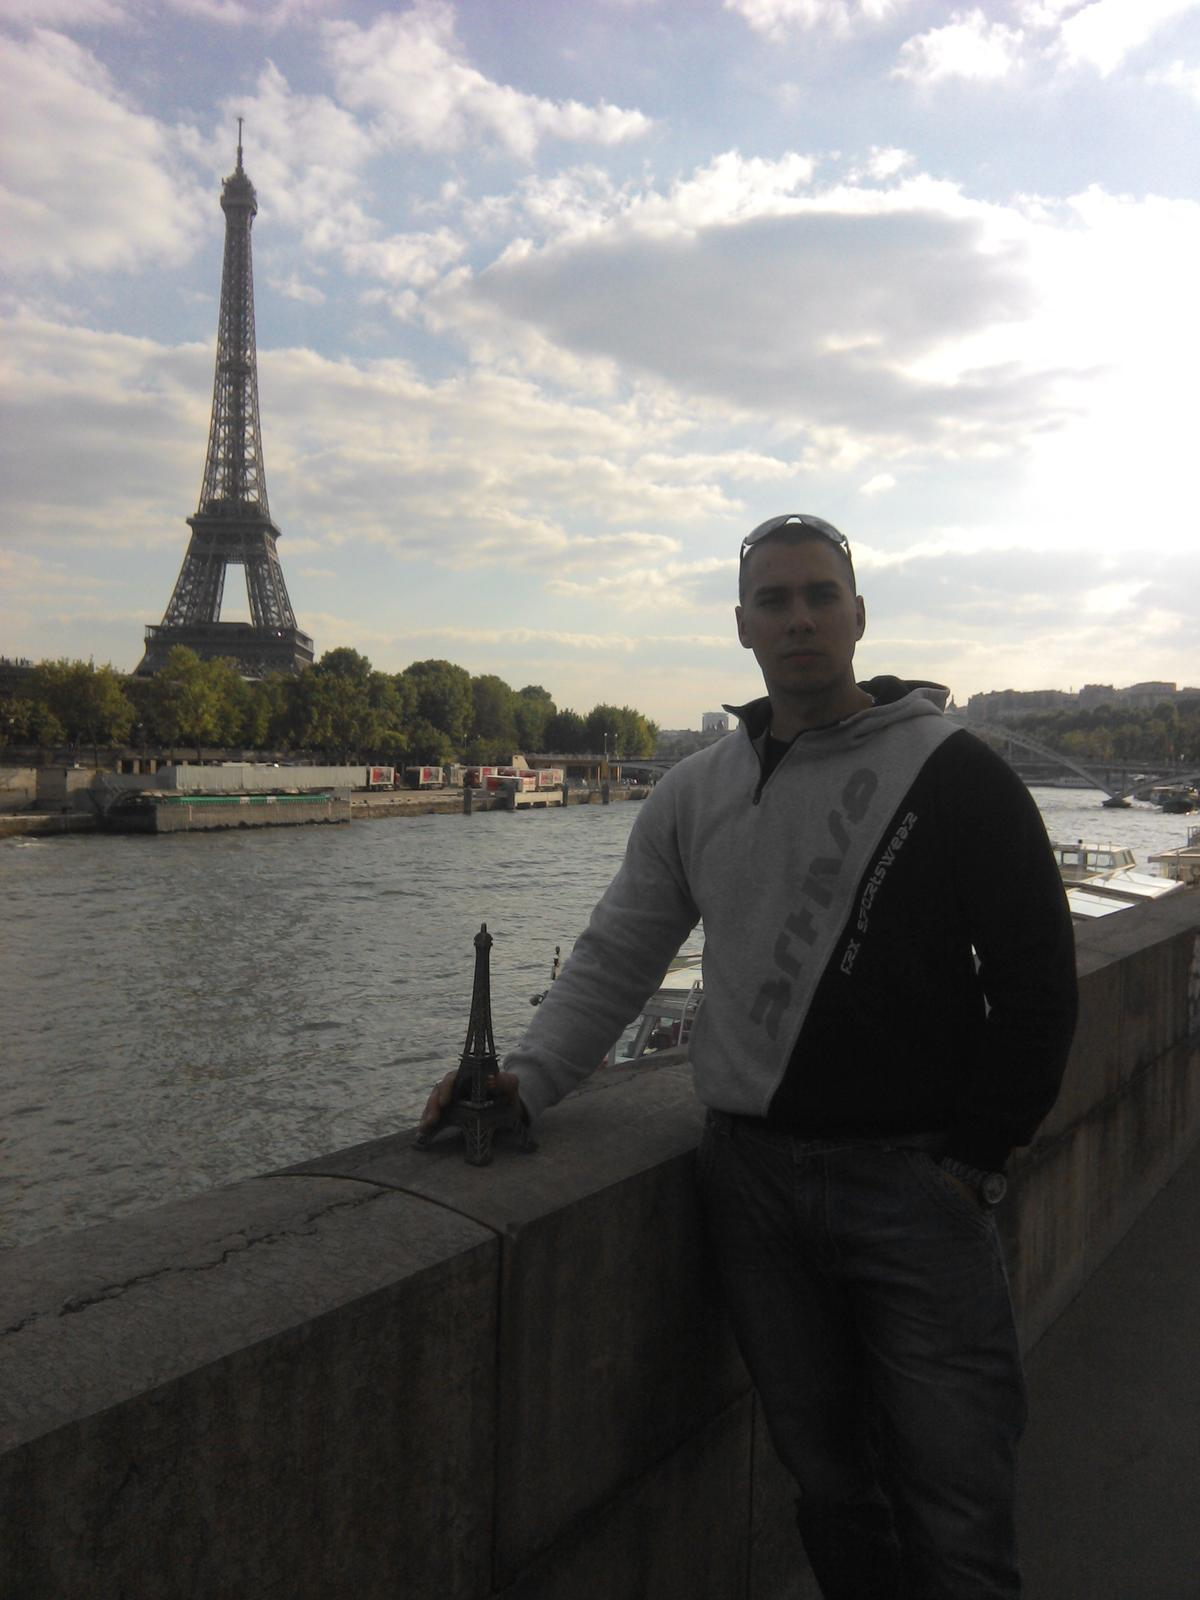 Zásnuby v Paríži 3.5.2014 :) - Obrázok č. 7